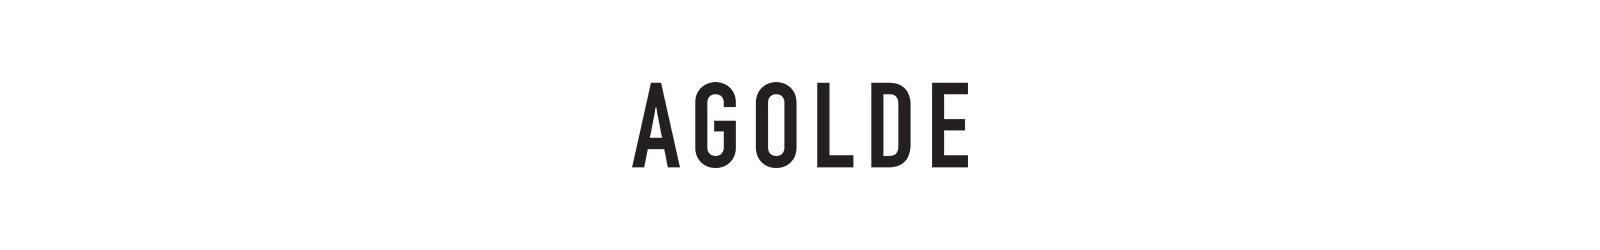 SAgolde